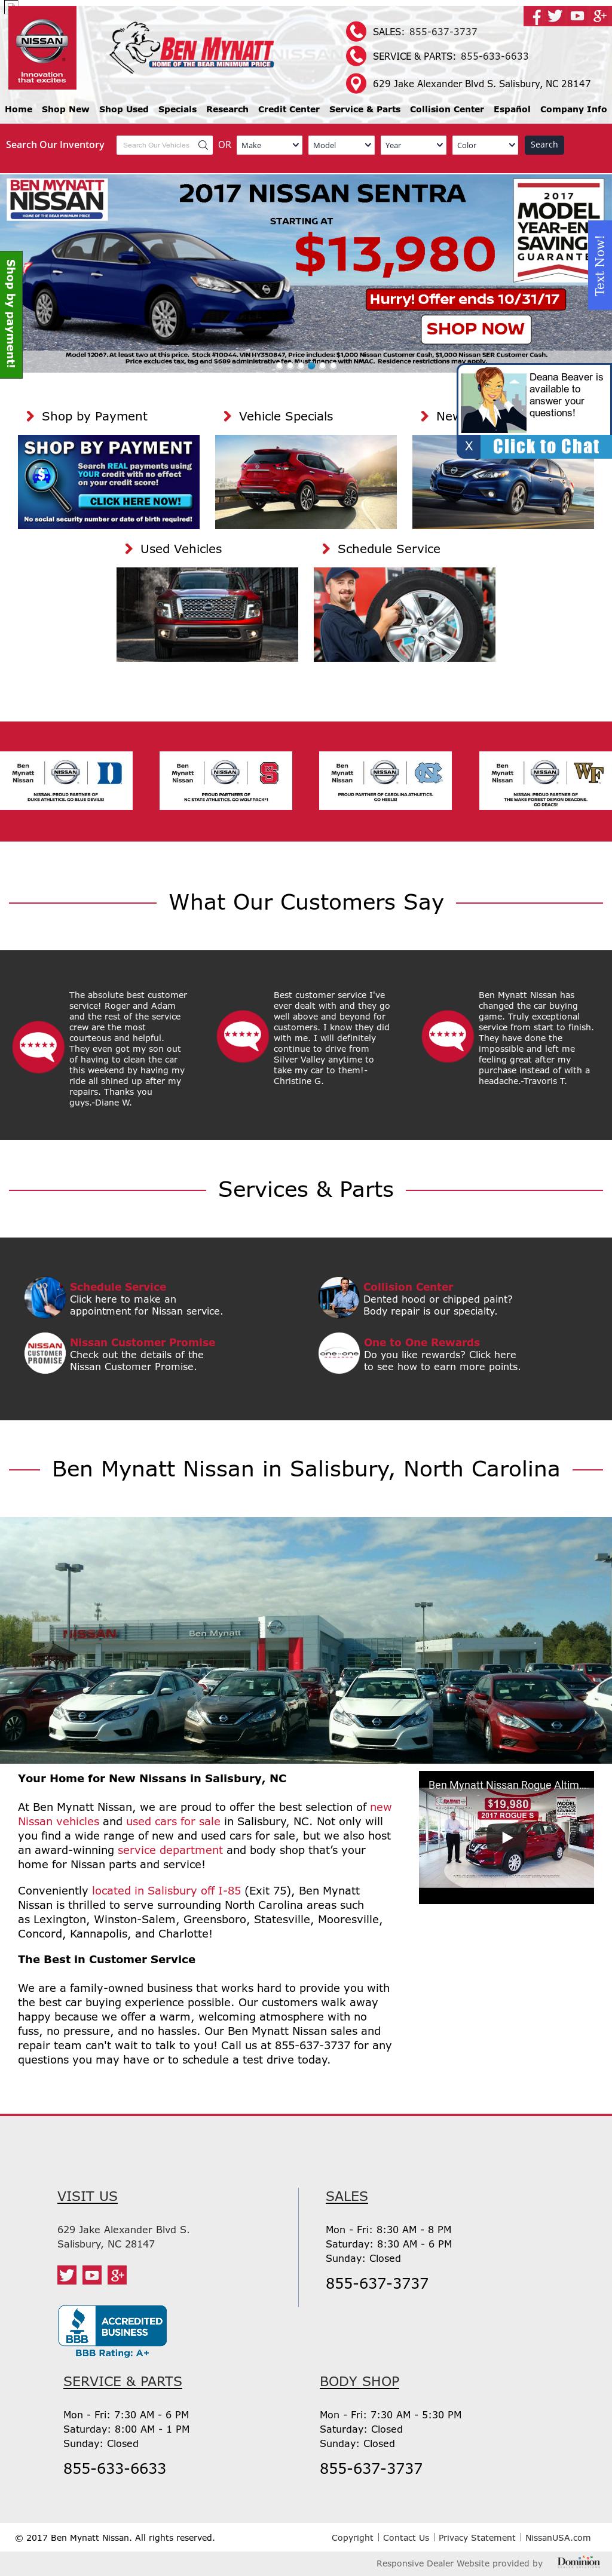 Ben Mynatt Nissan Competitors, Revenue and Employees - Owler Company ...